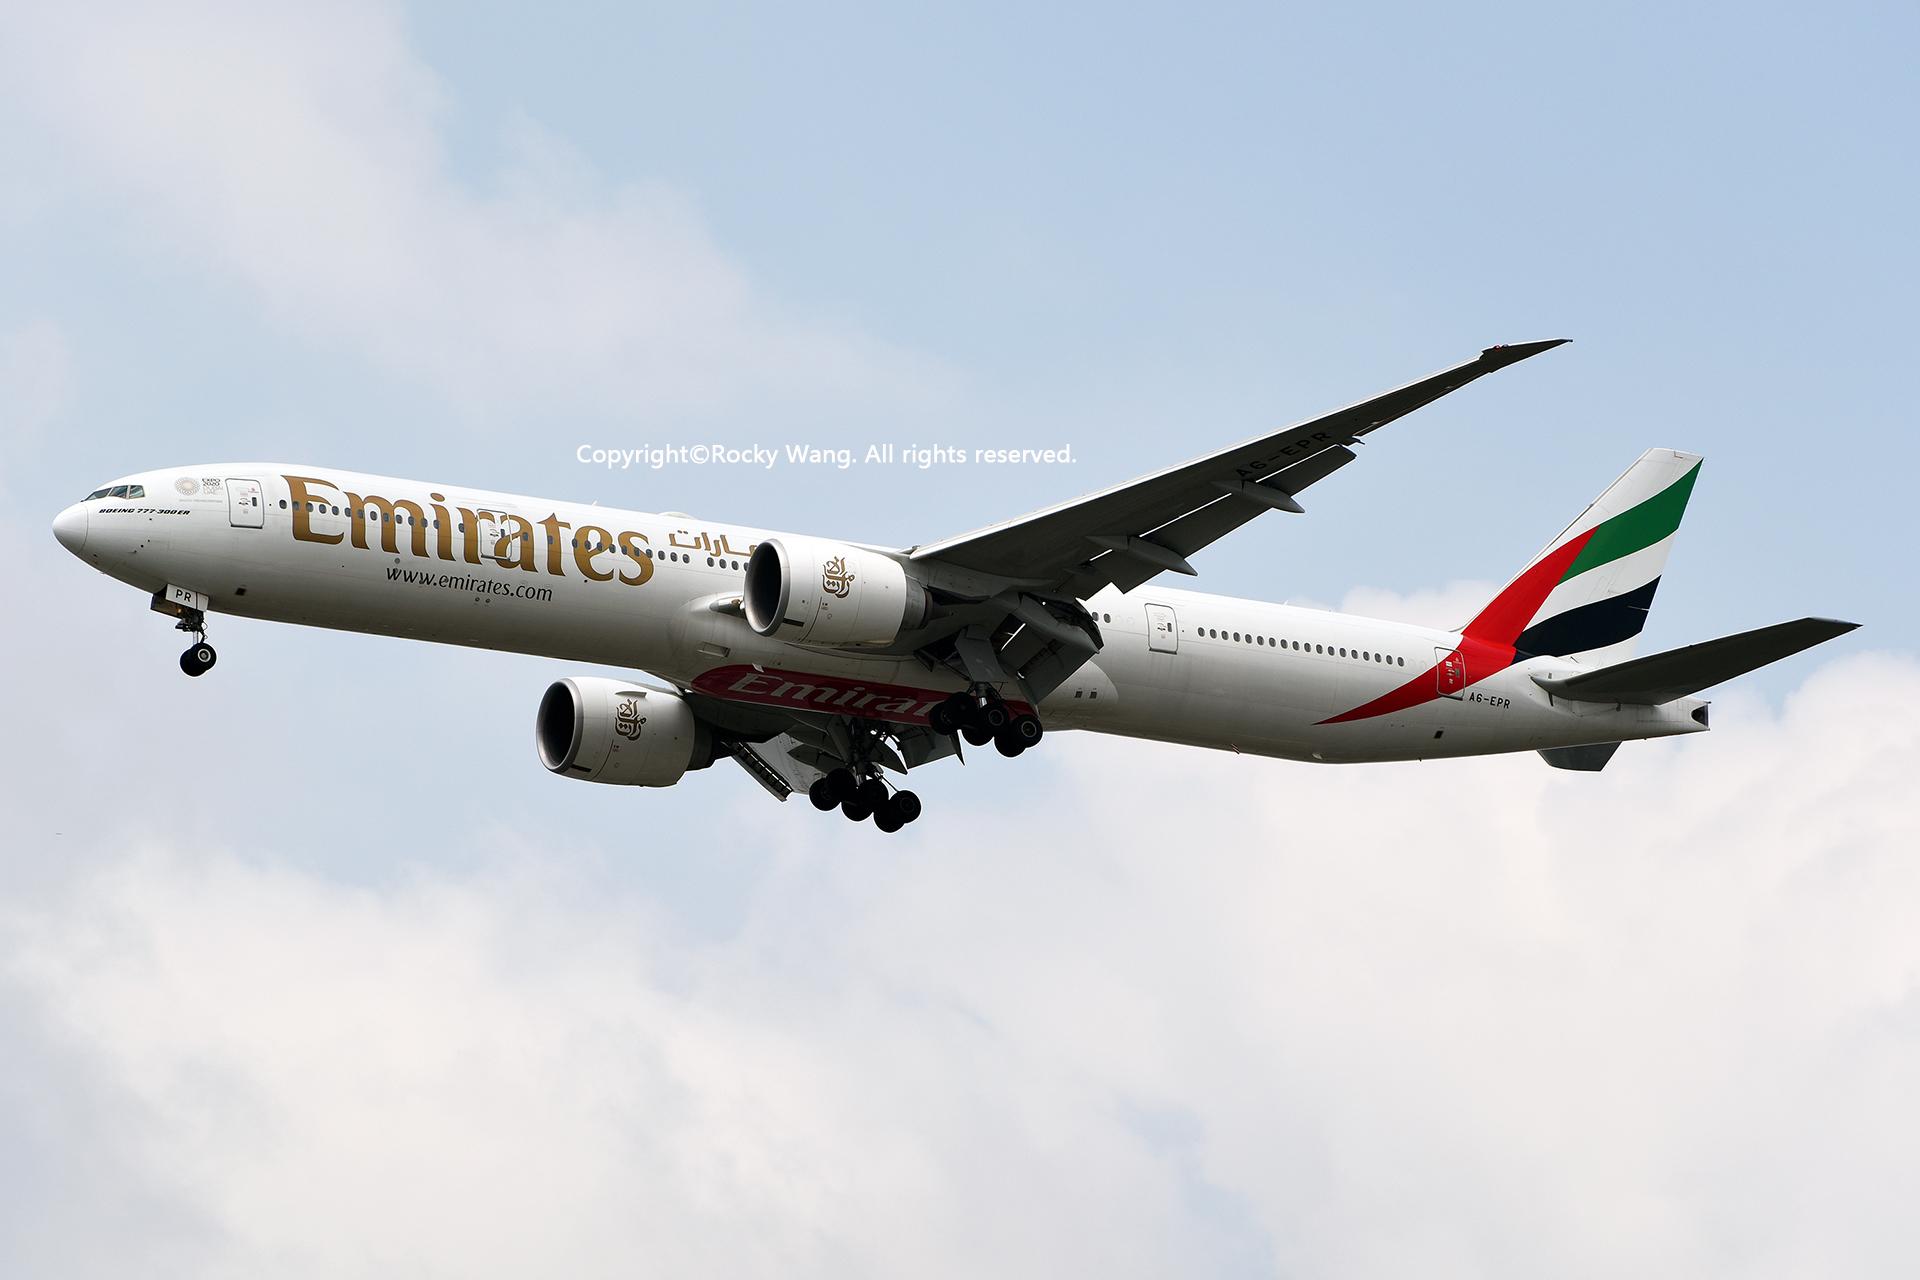 Re:[原创]居家了 批量处理老图 倾情奉献52家777 BOEING 777-31HER A6-EPR Bangkok Suvarnabhumi Int'l